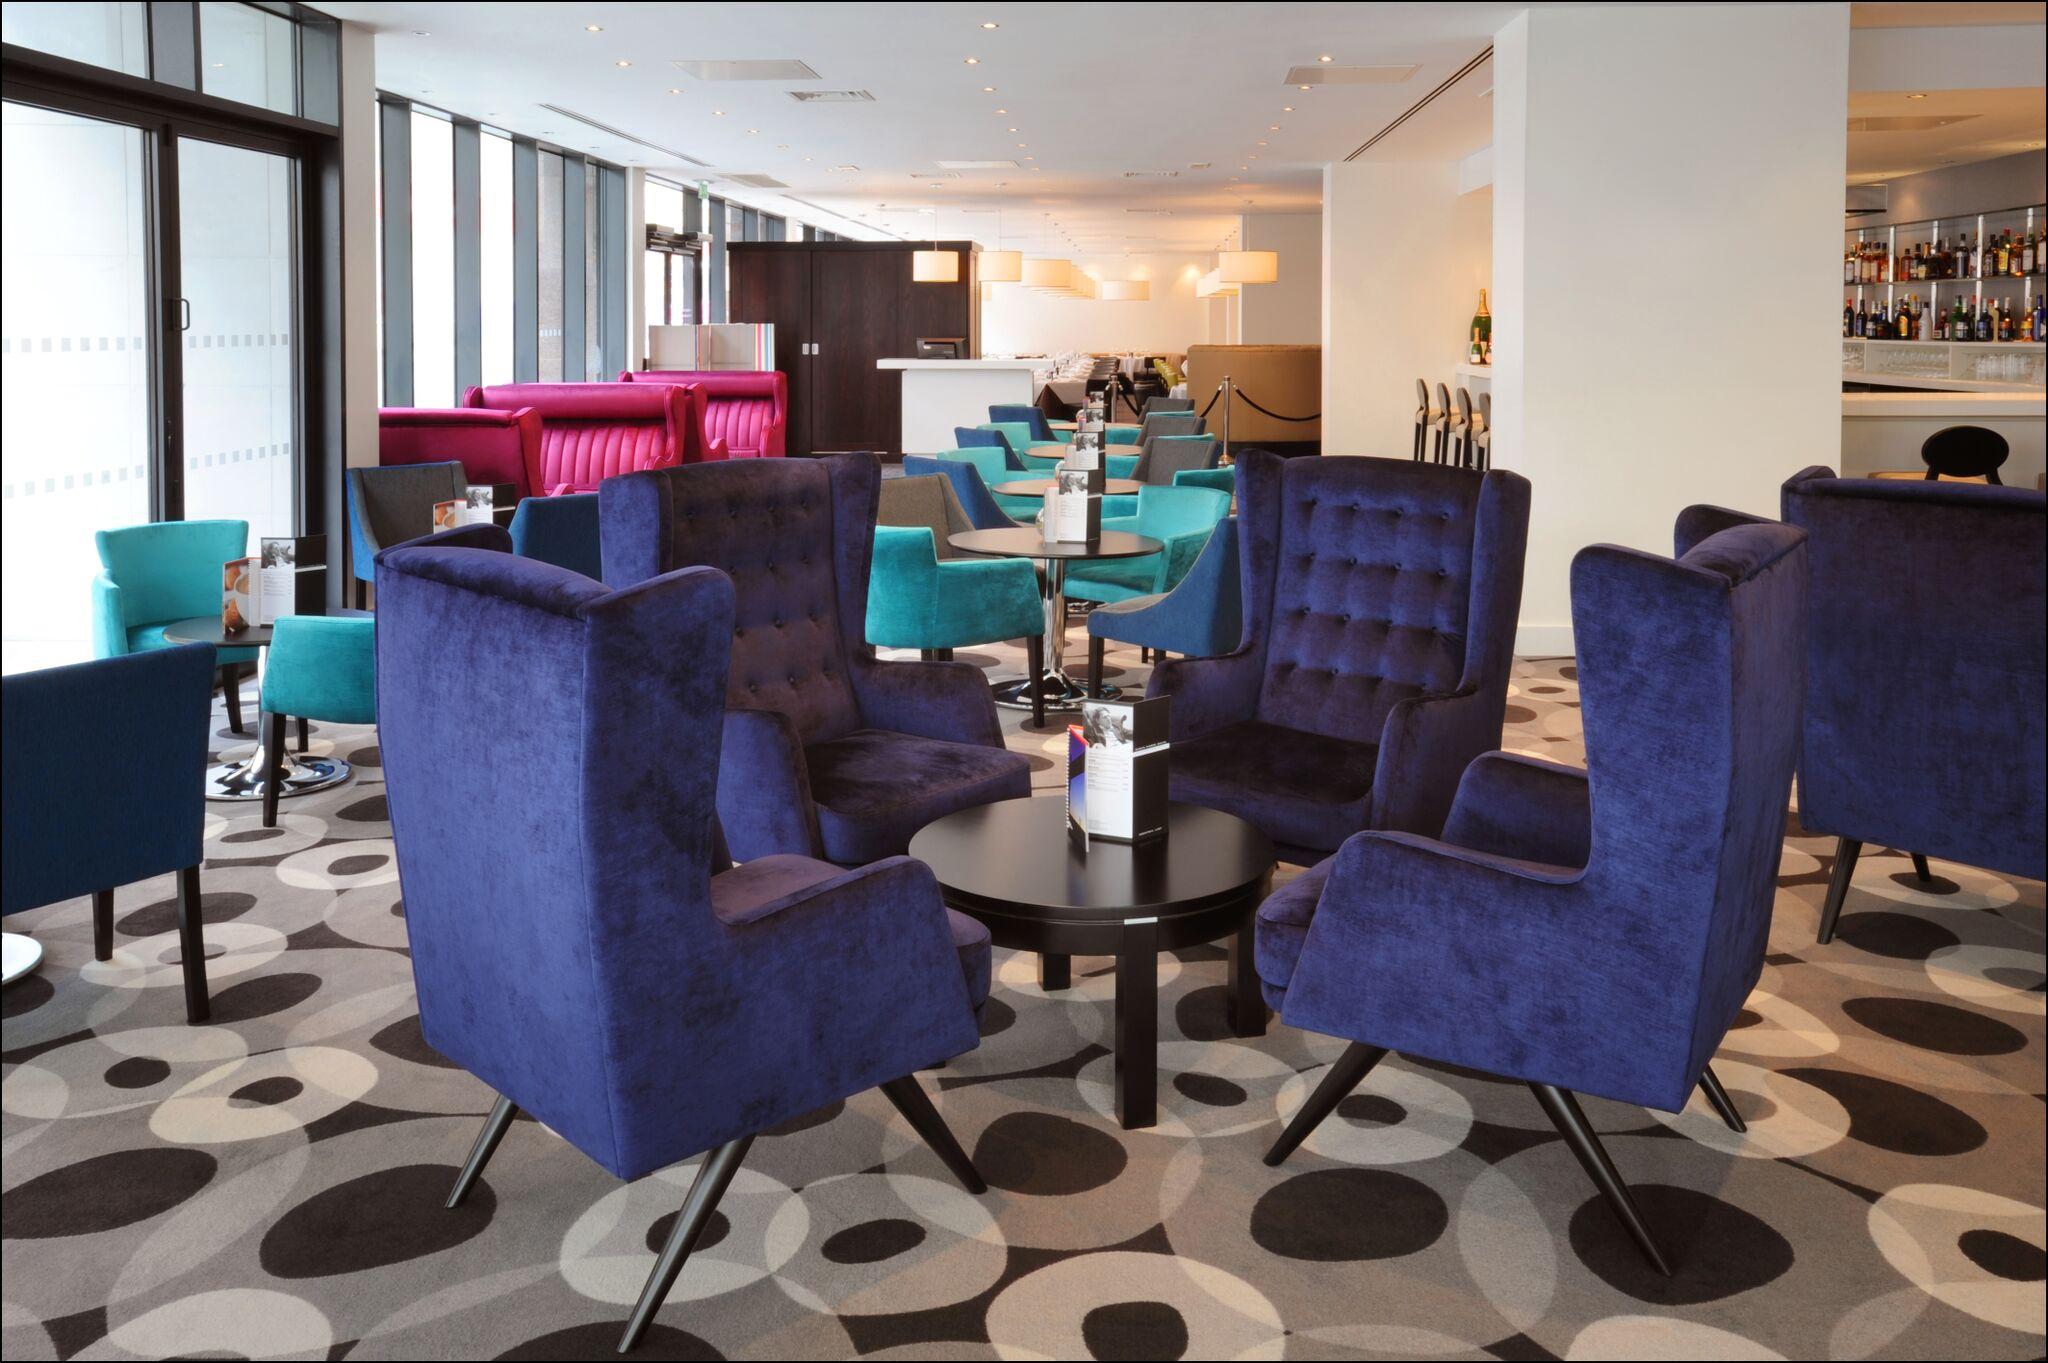 HOTEL INDIGO - NEWCASTLE